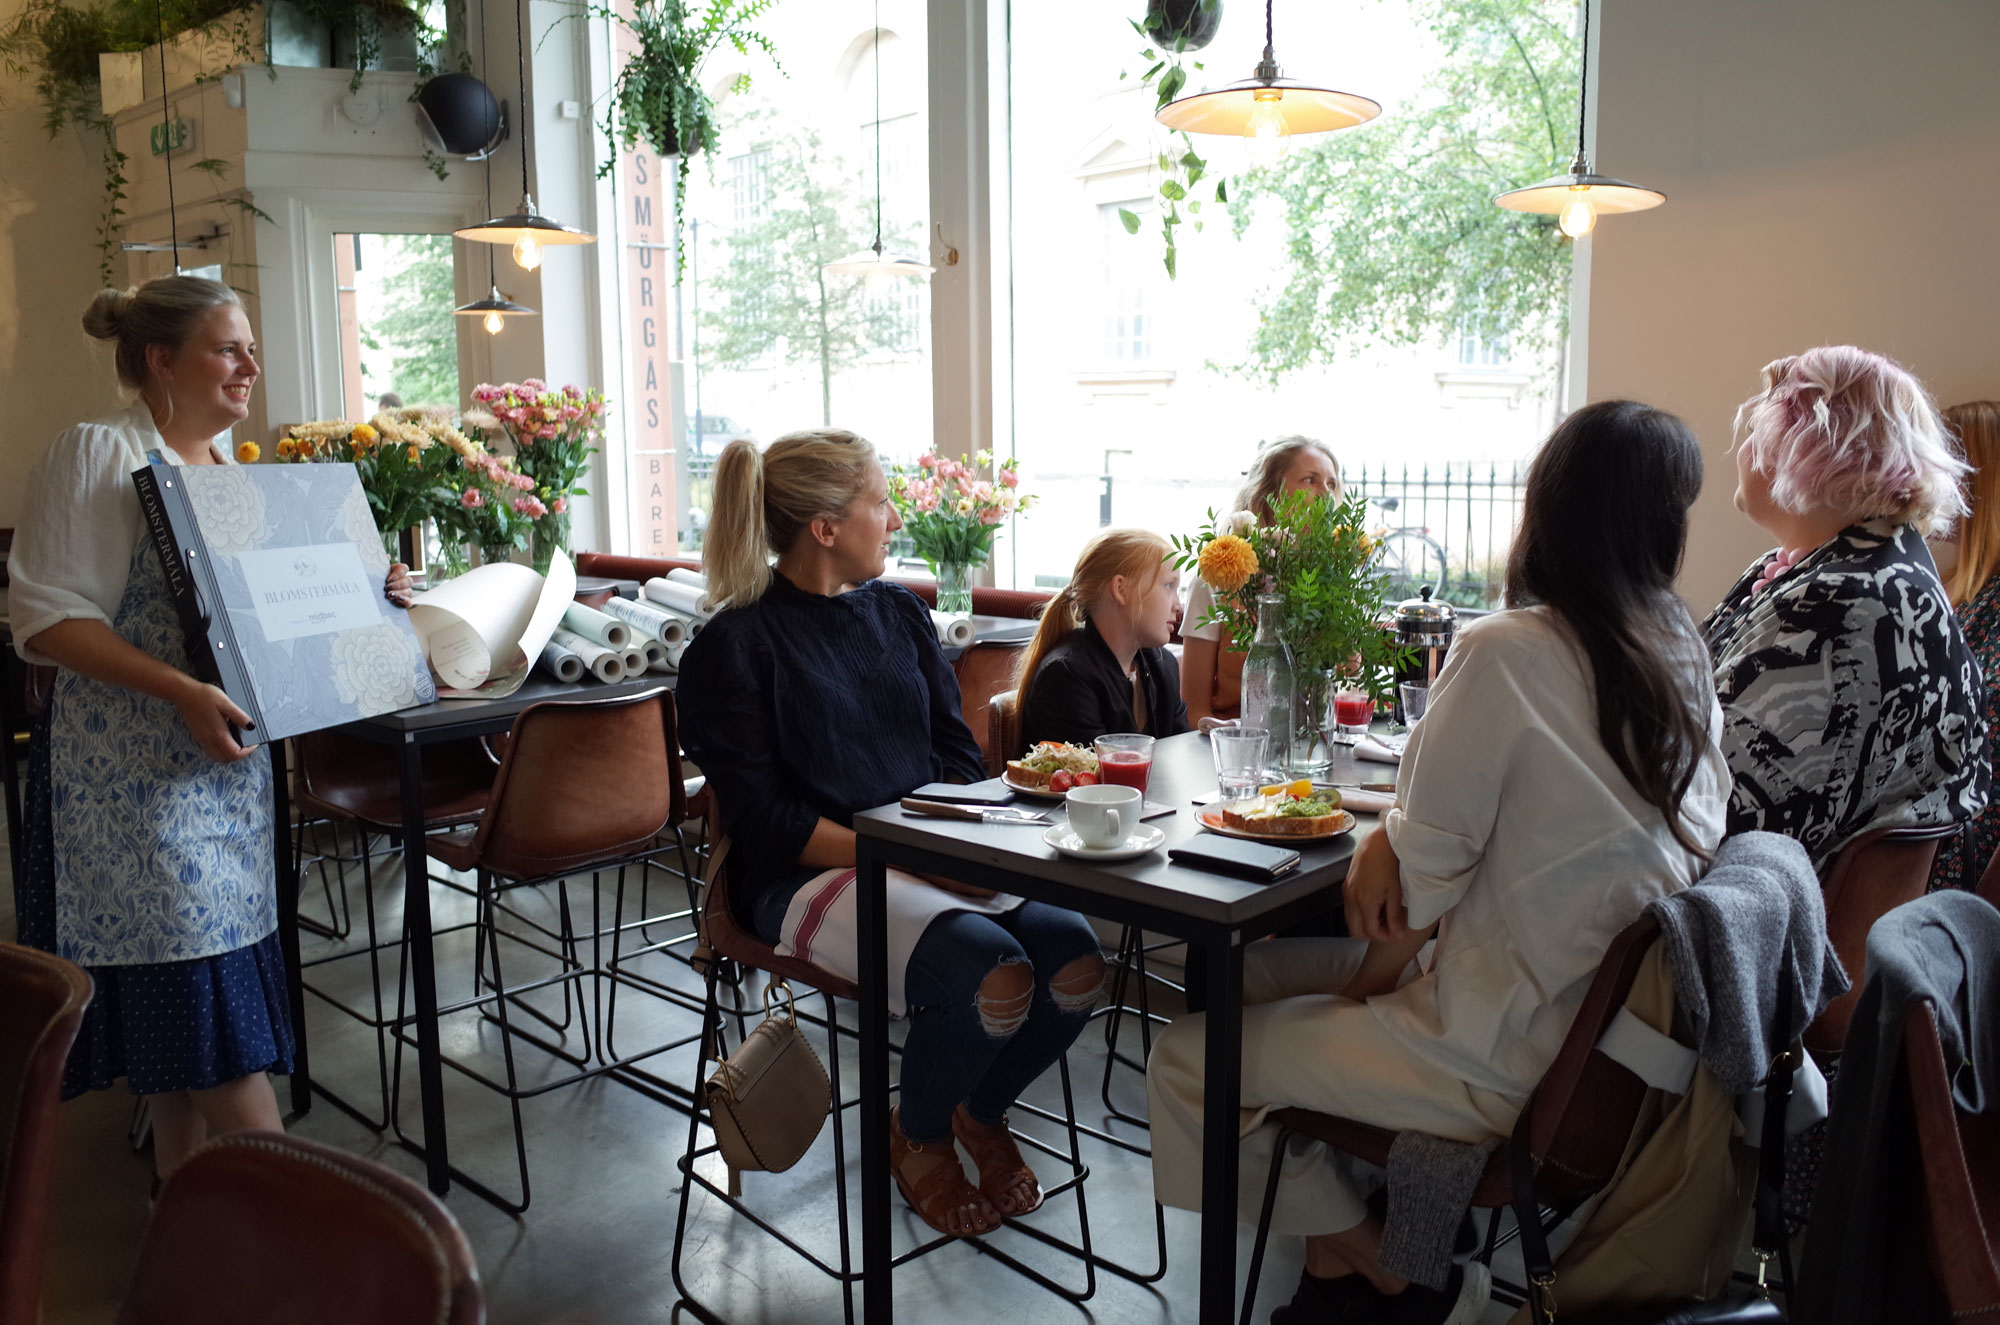 tapetfrukost-blomstermåla-smörgåsbaren-hanna-wendelbo-lansering-midbec